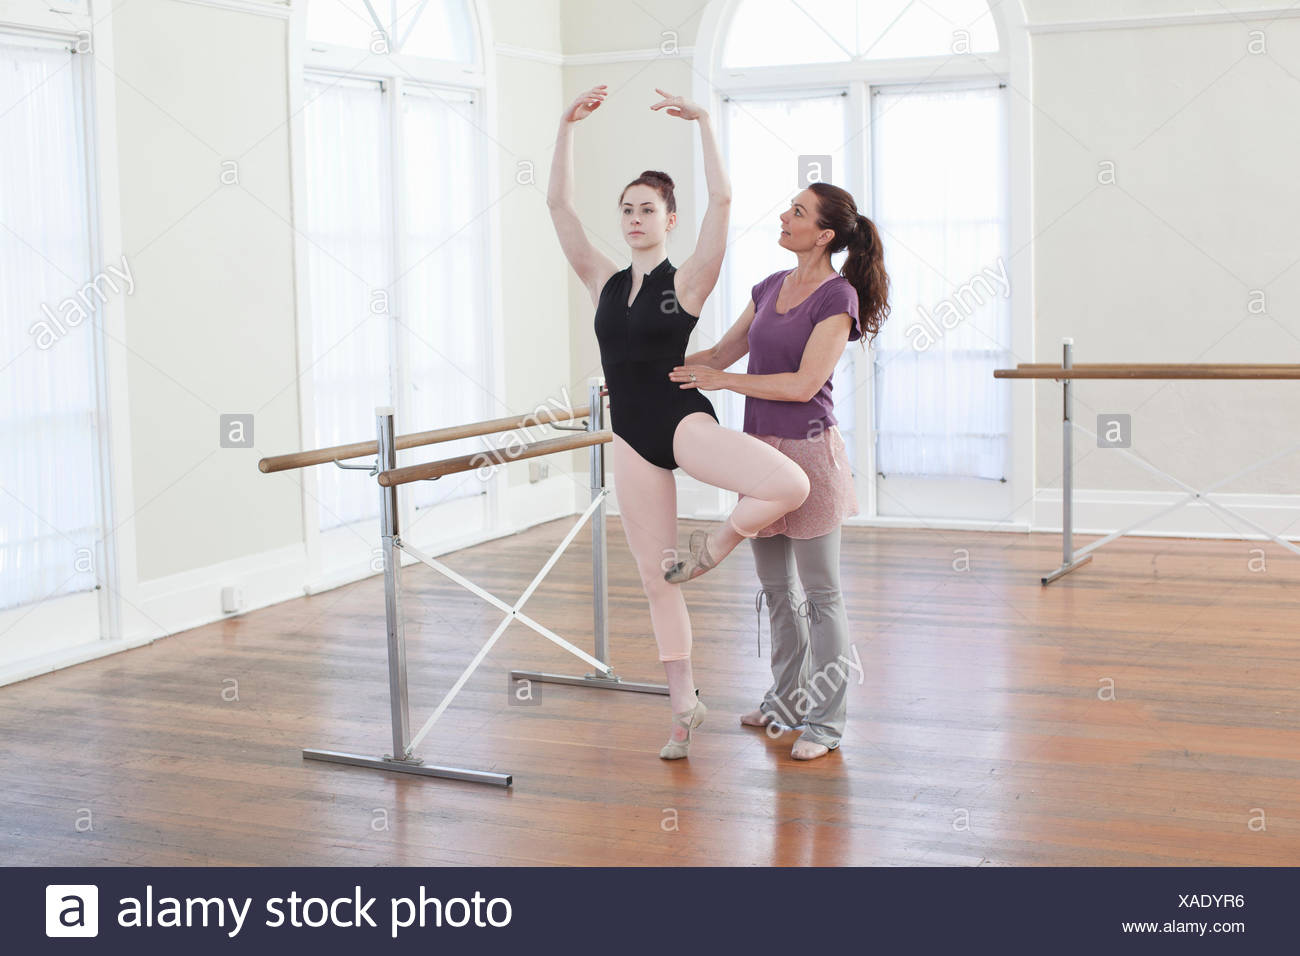 Teacher teaching ballet position to teenage ballerina at ballet school - Stock Image